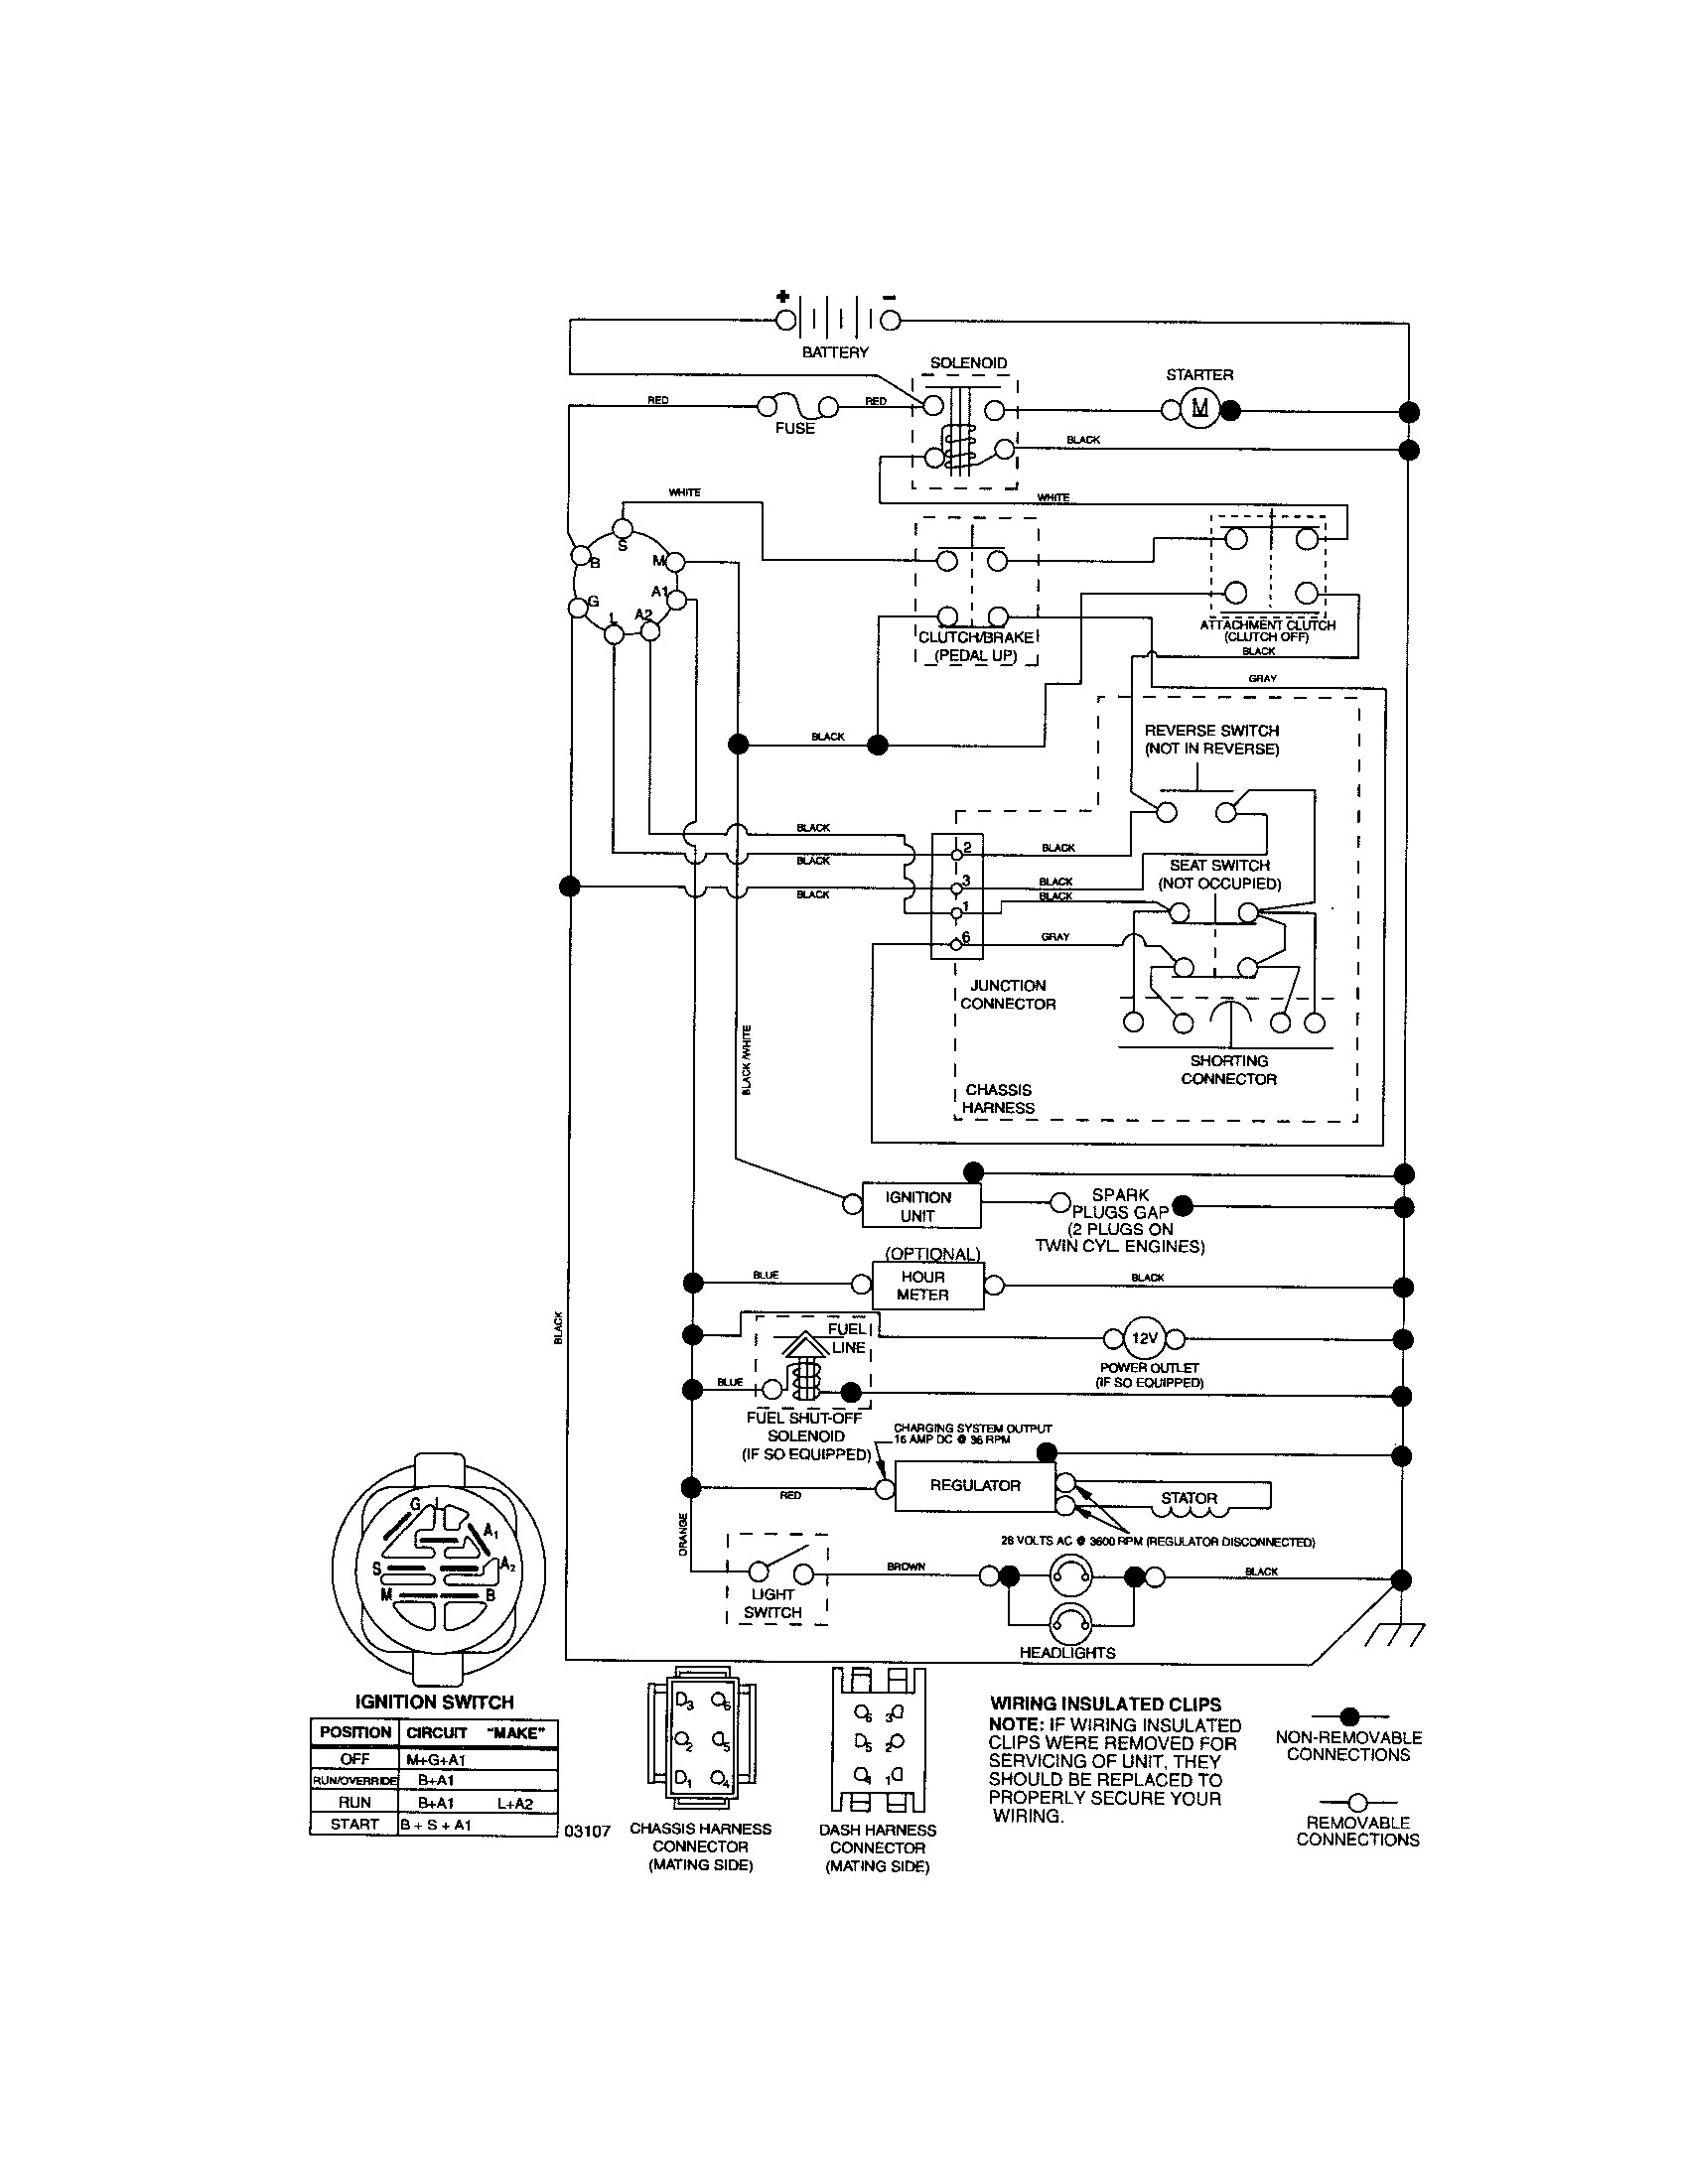 L110 John Deere Wiring Diagram Toyota